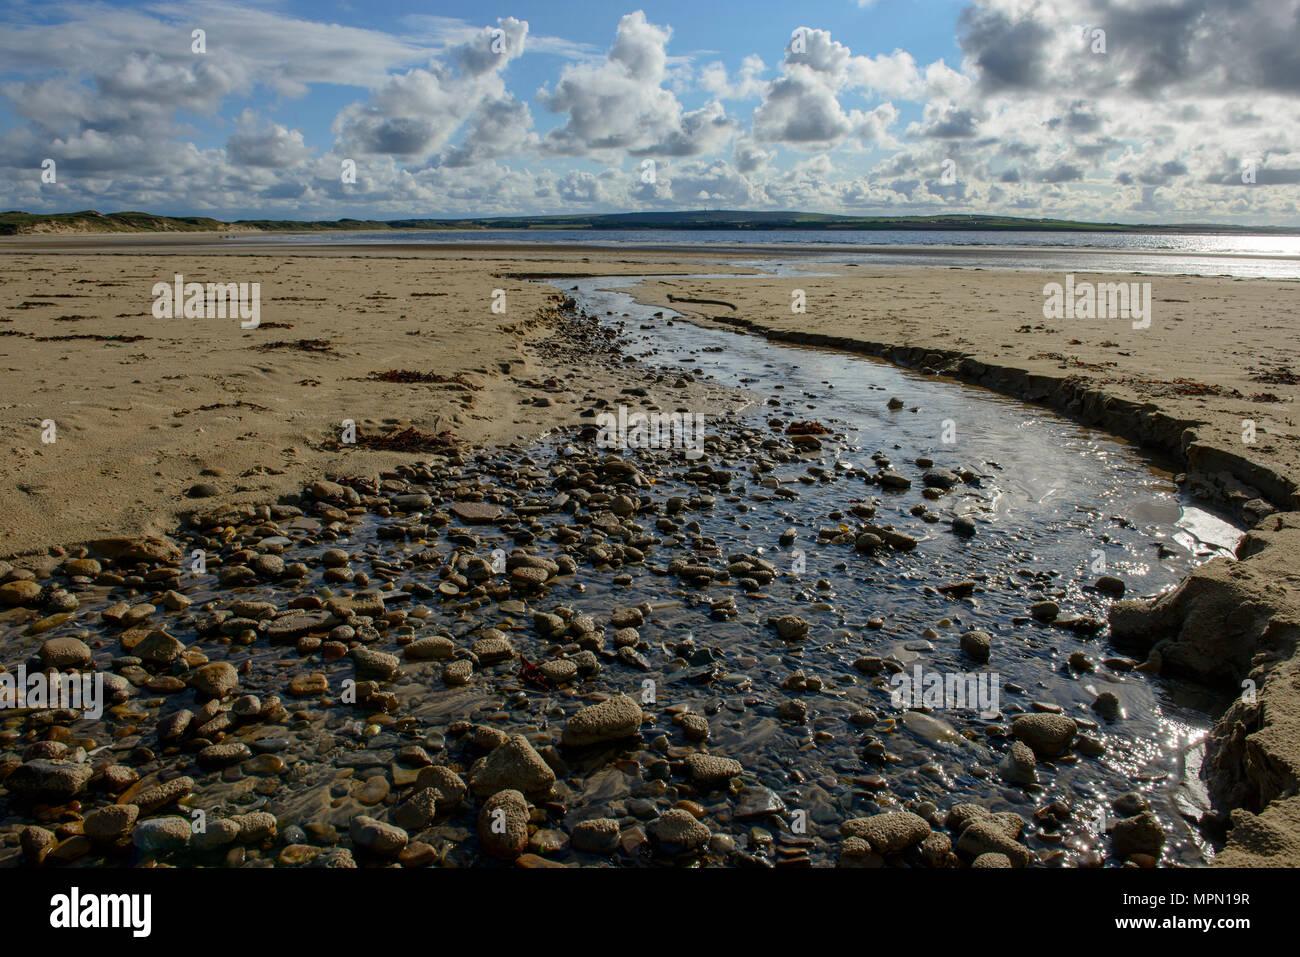 United Kingdom, Scotland, Highland, Sutherland, Caithness, Thurso, Dunnet Beach near Castletown - Stock Image